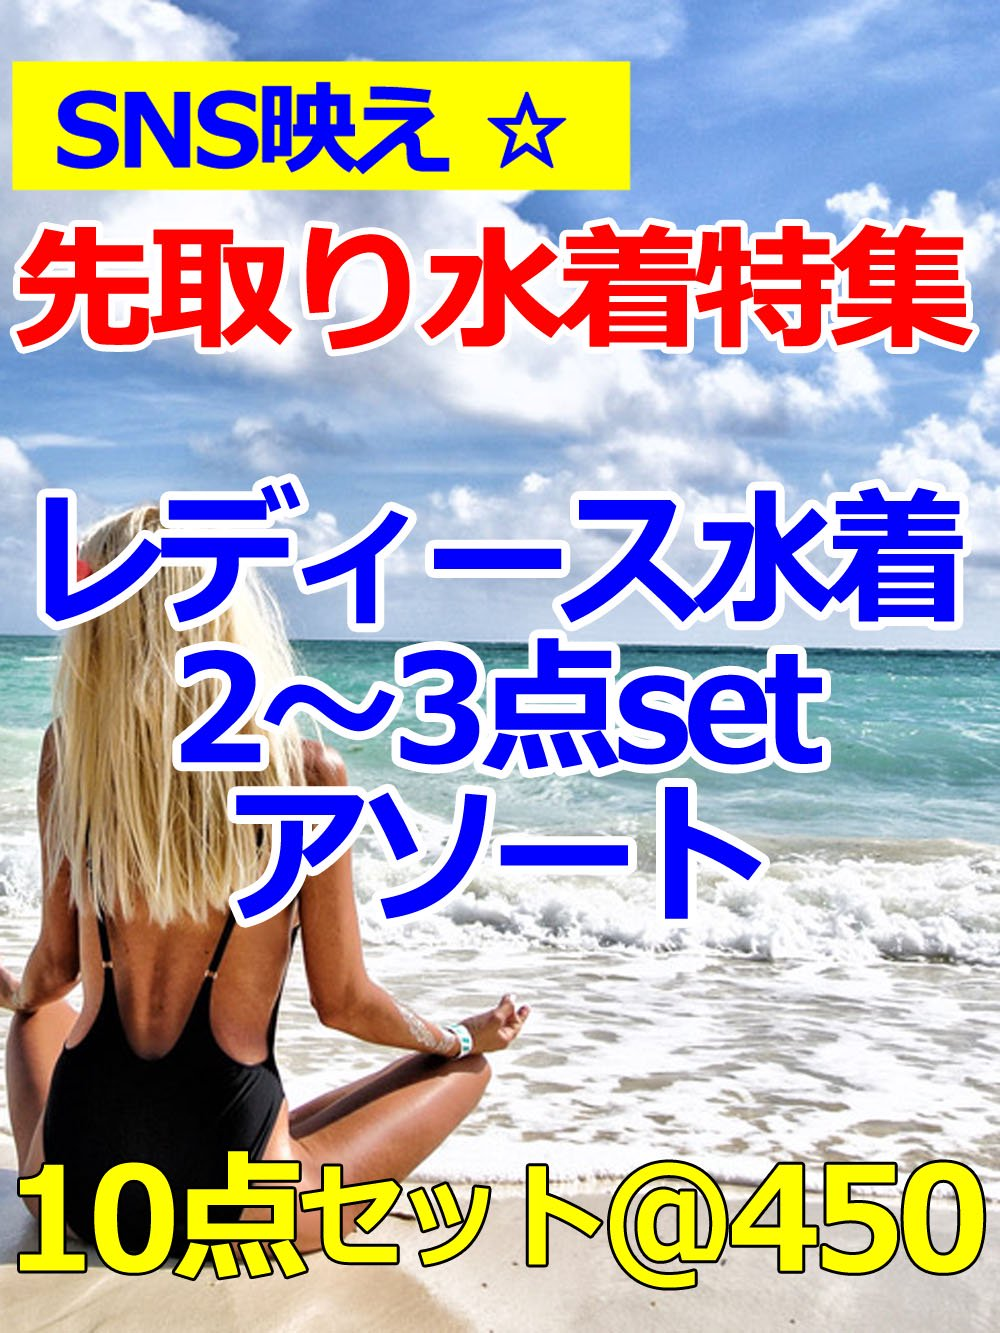 【 SNS映え 先取り水着特集 】レディース水着2〜3点セット アソート☆【10点】@450